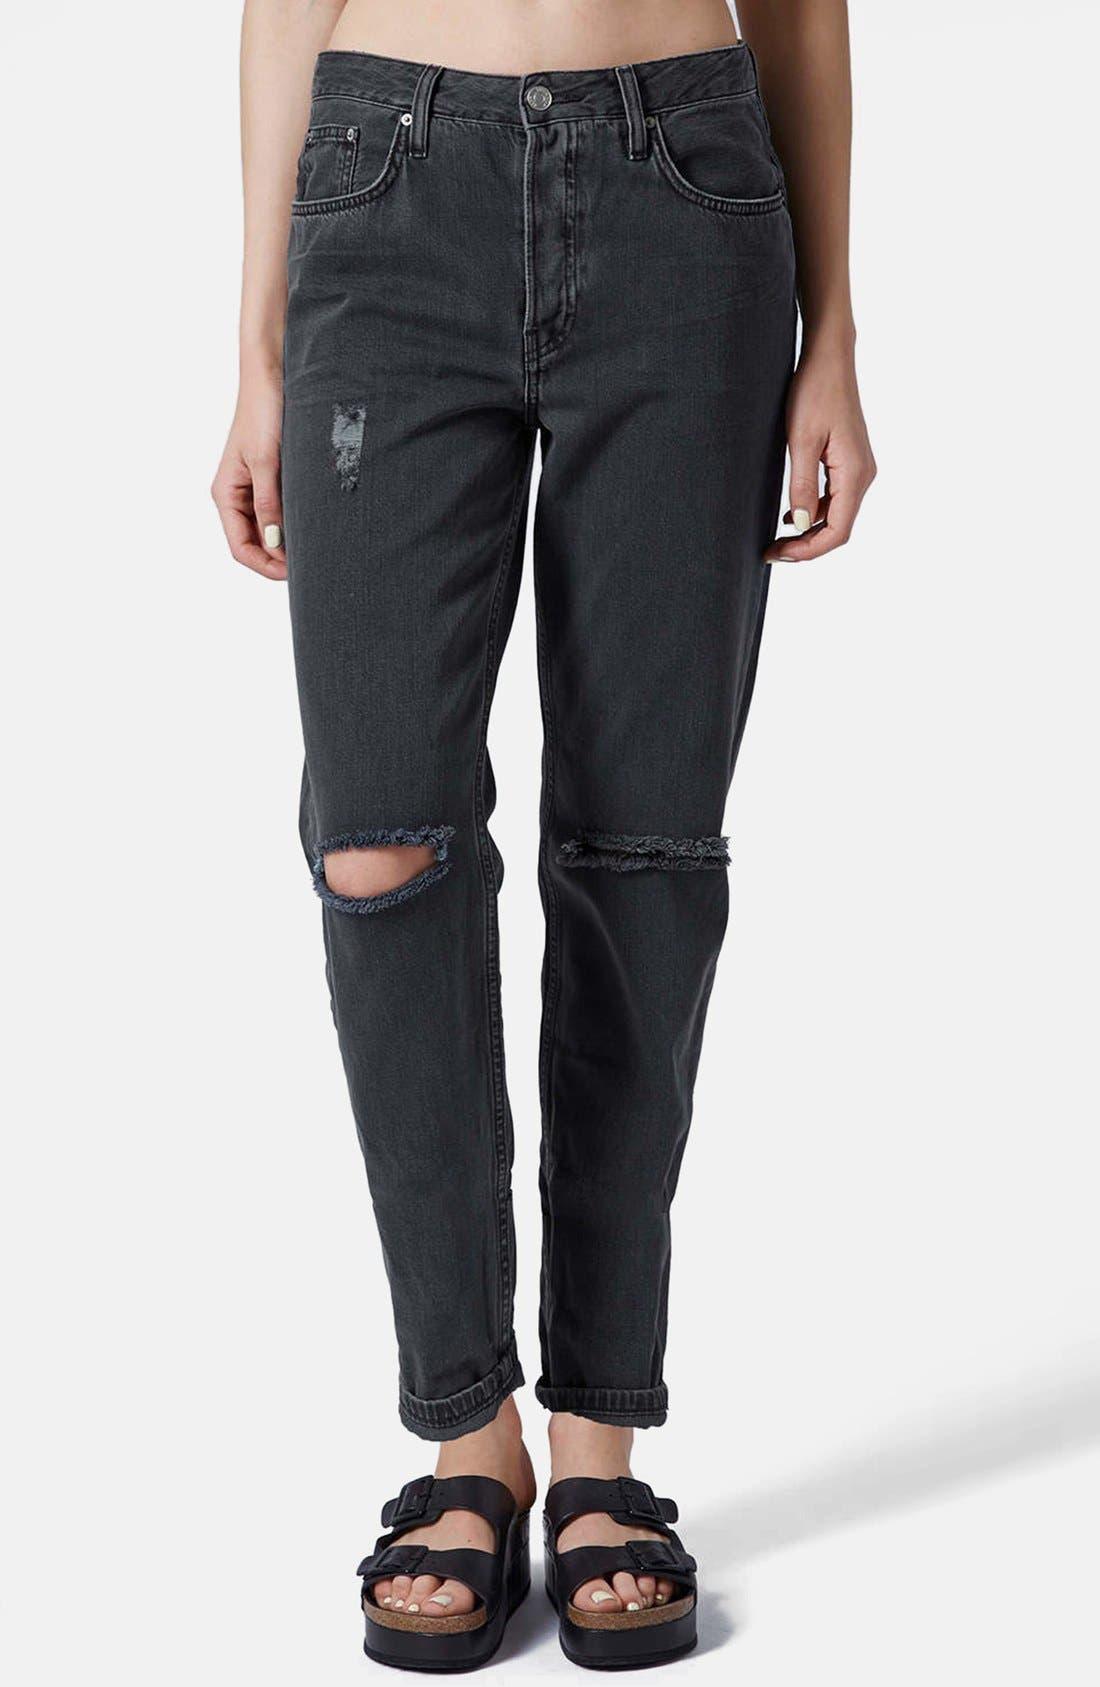 Alternate Image 1 Selected - Topshop Moto 'Hayden' Ripped Boyfriend Jeans (Black)